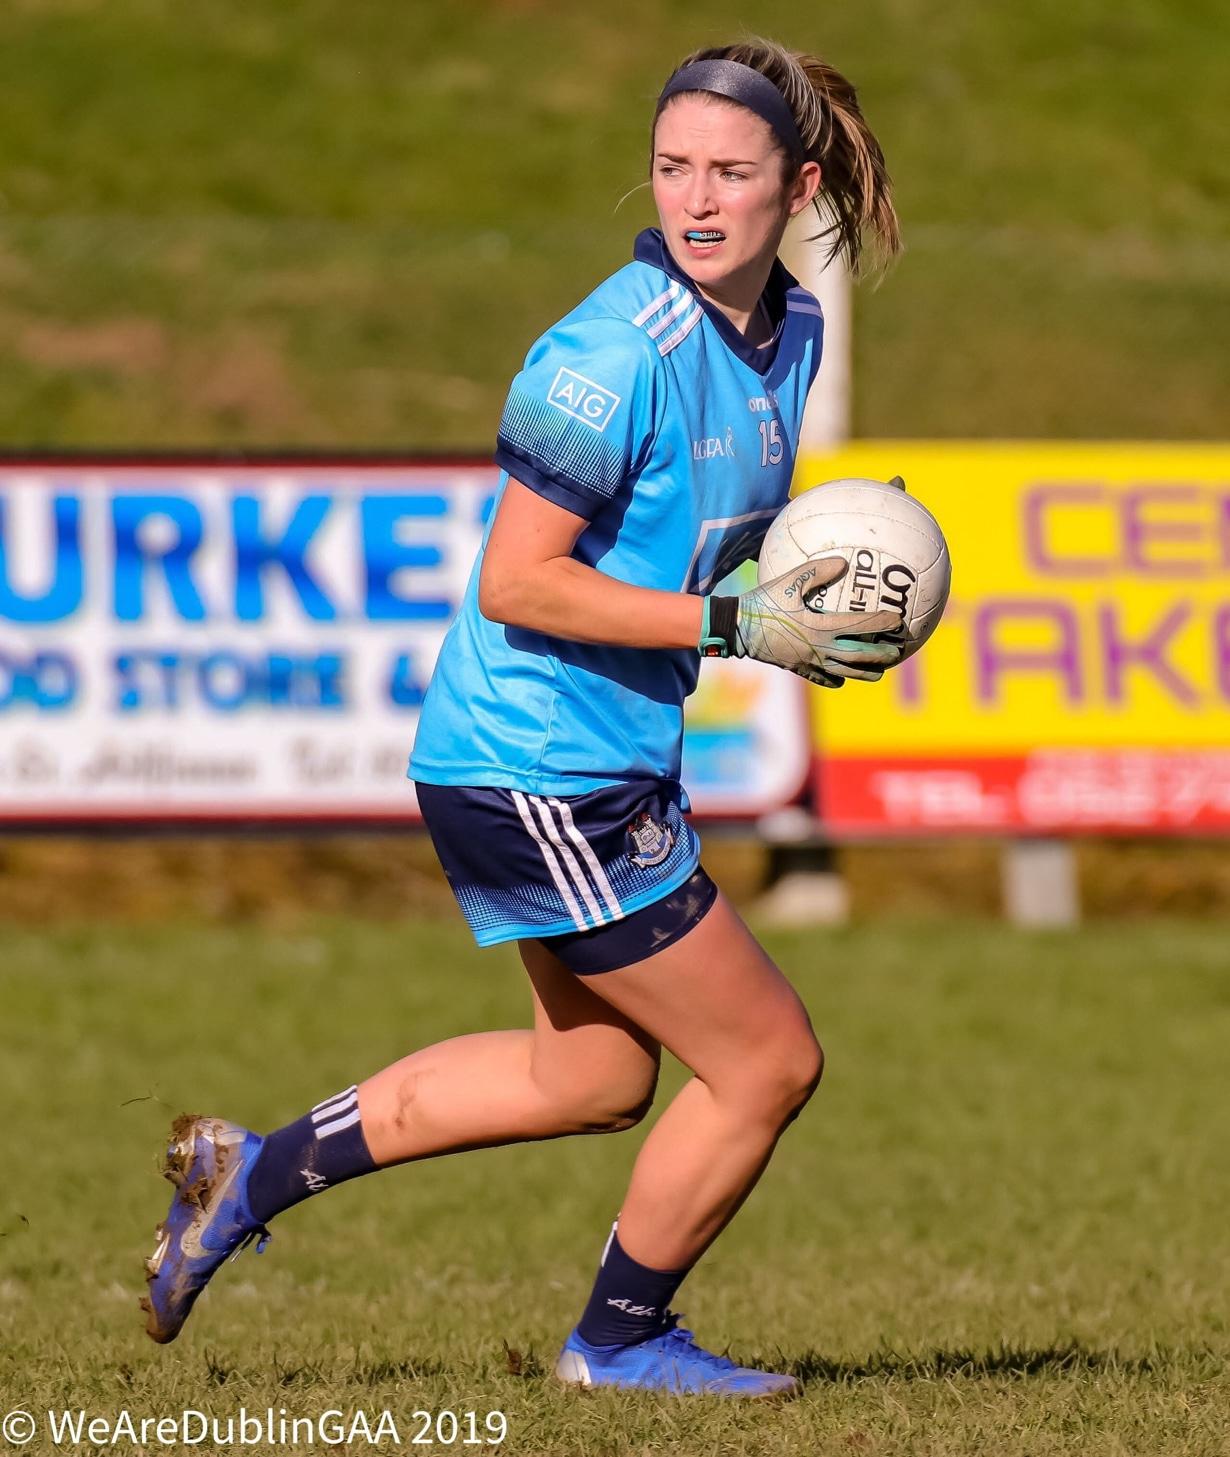 Dublin's Siobhan Killeen has tested positive for Covid-19